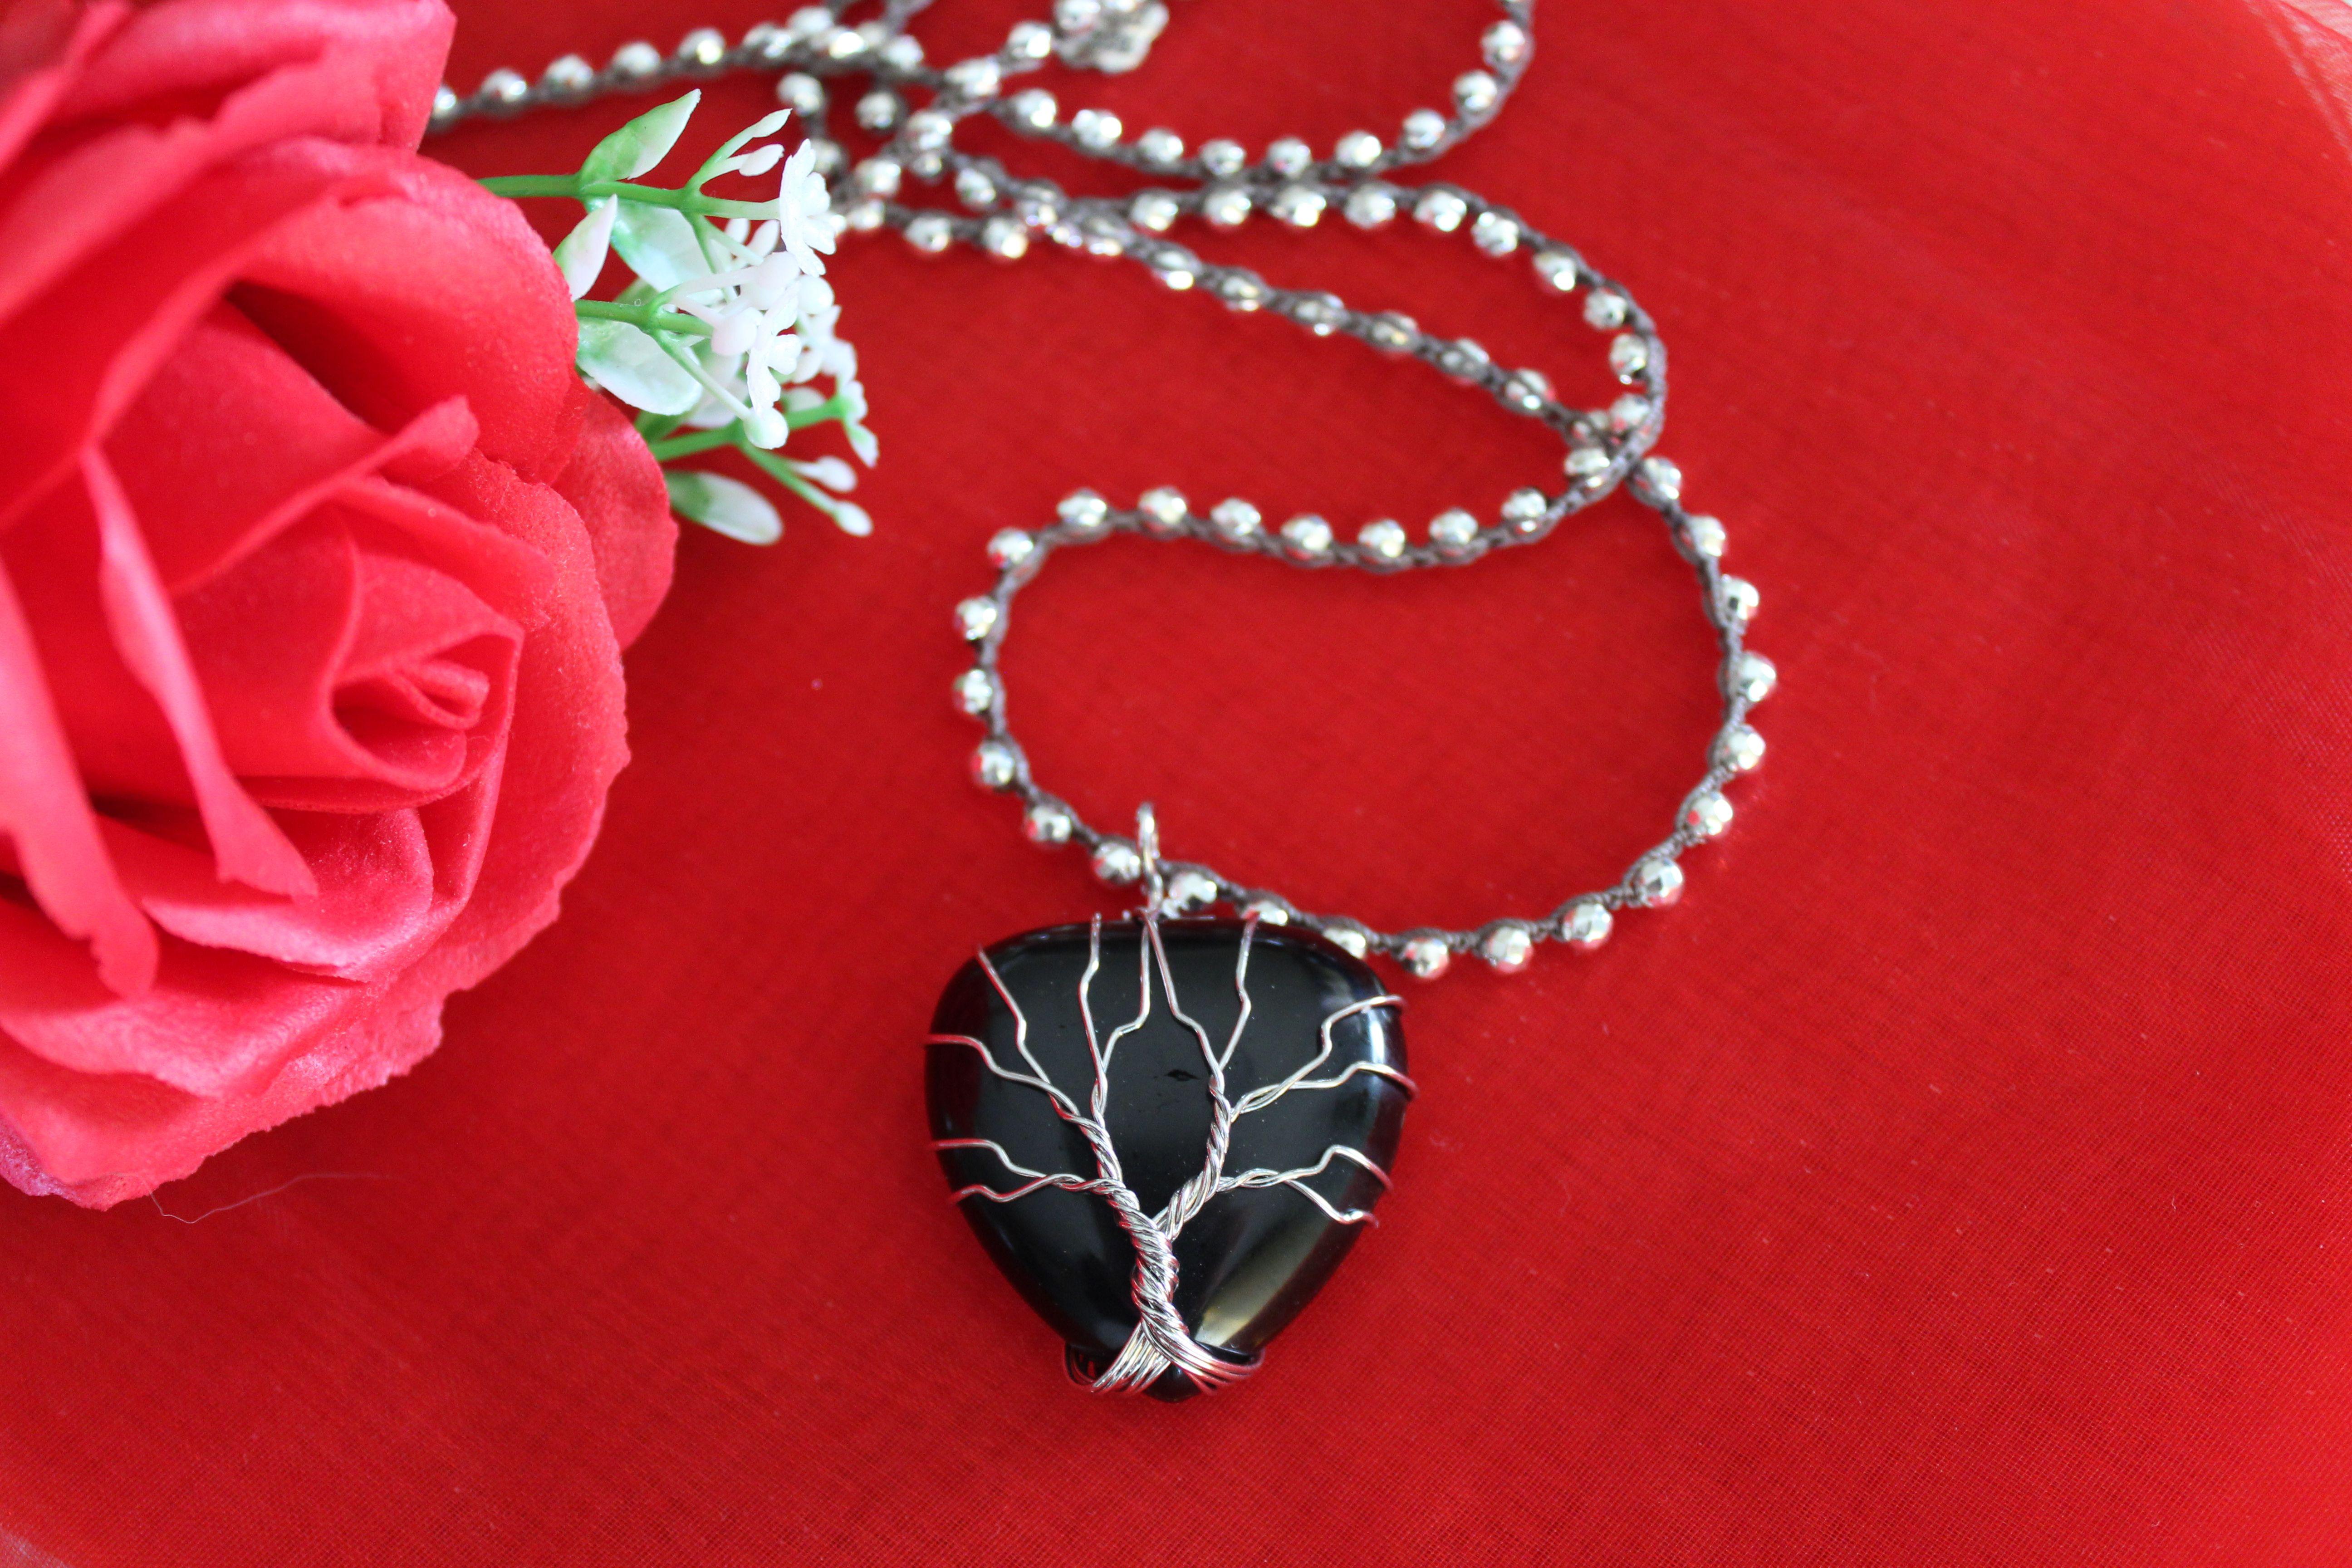 Heart Shaped Jewelry Black Stone Heart Necklace/Tree of